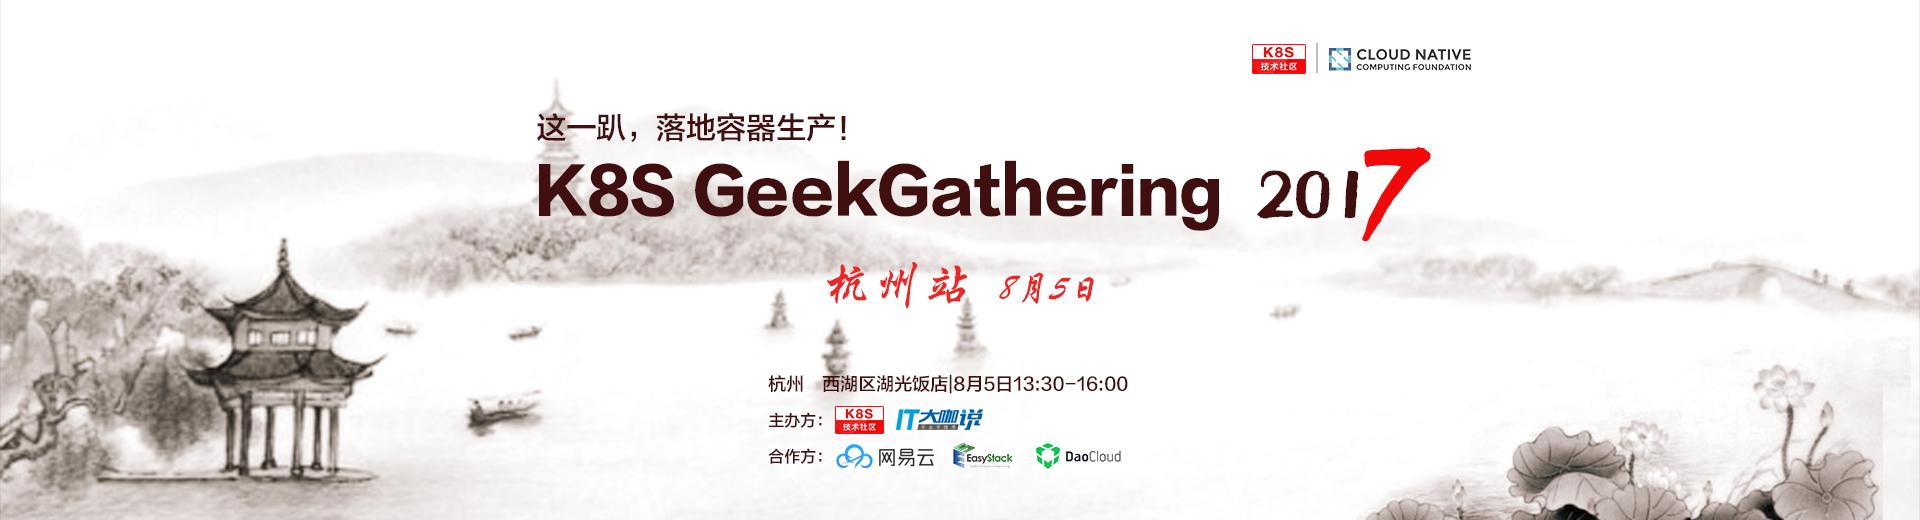 K8S GeekGathering杭州站线下大趴